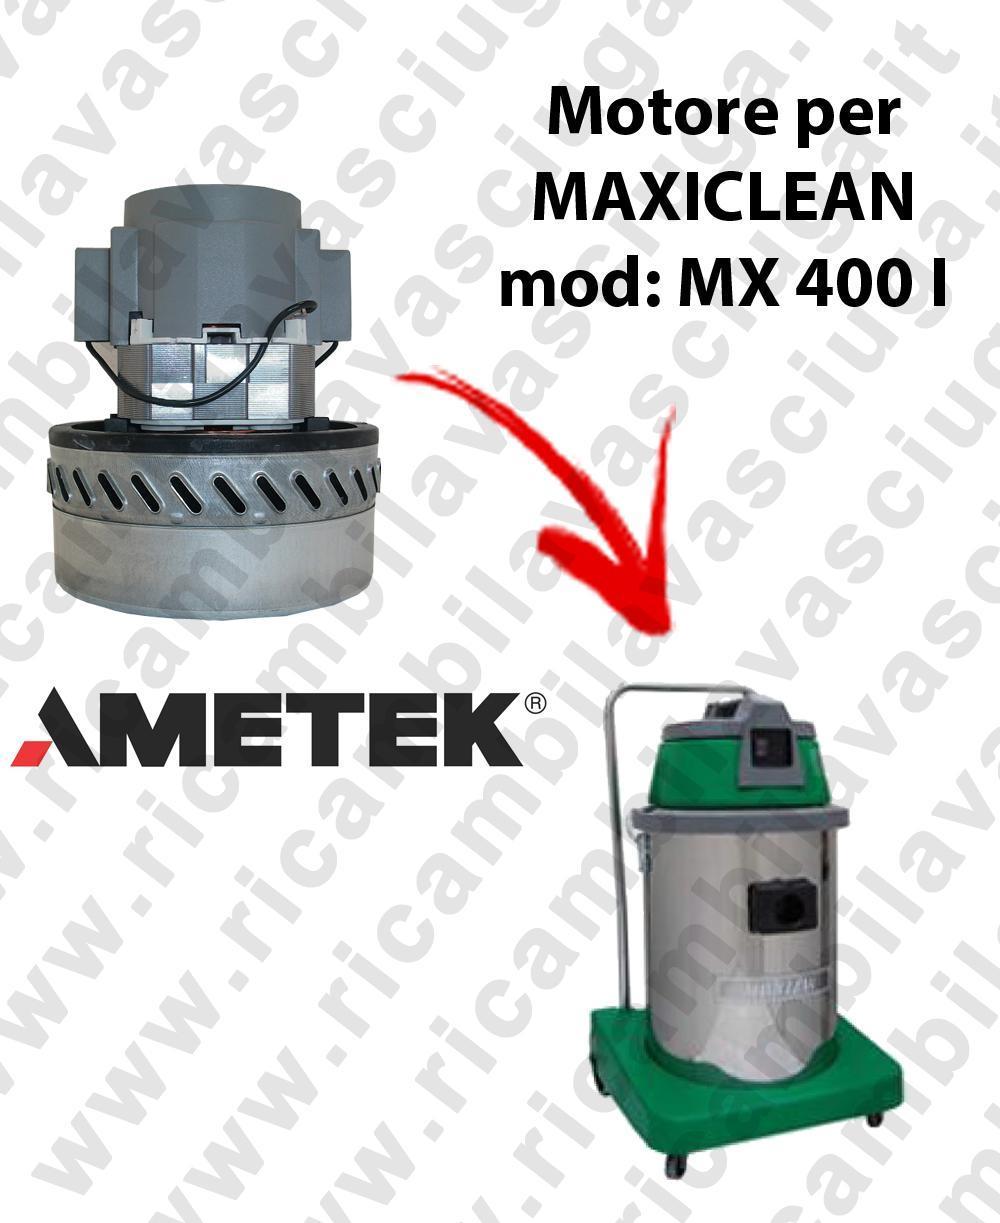 MX 400 I AMETEK vacuum motor for wet and dry vacuum cleaner MAXICLEAN